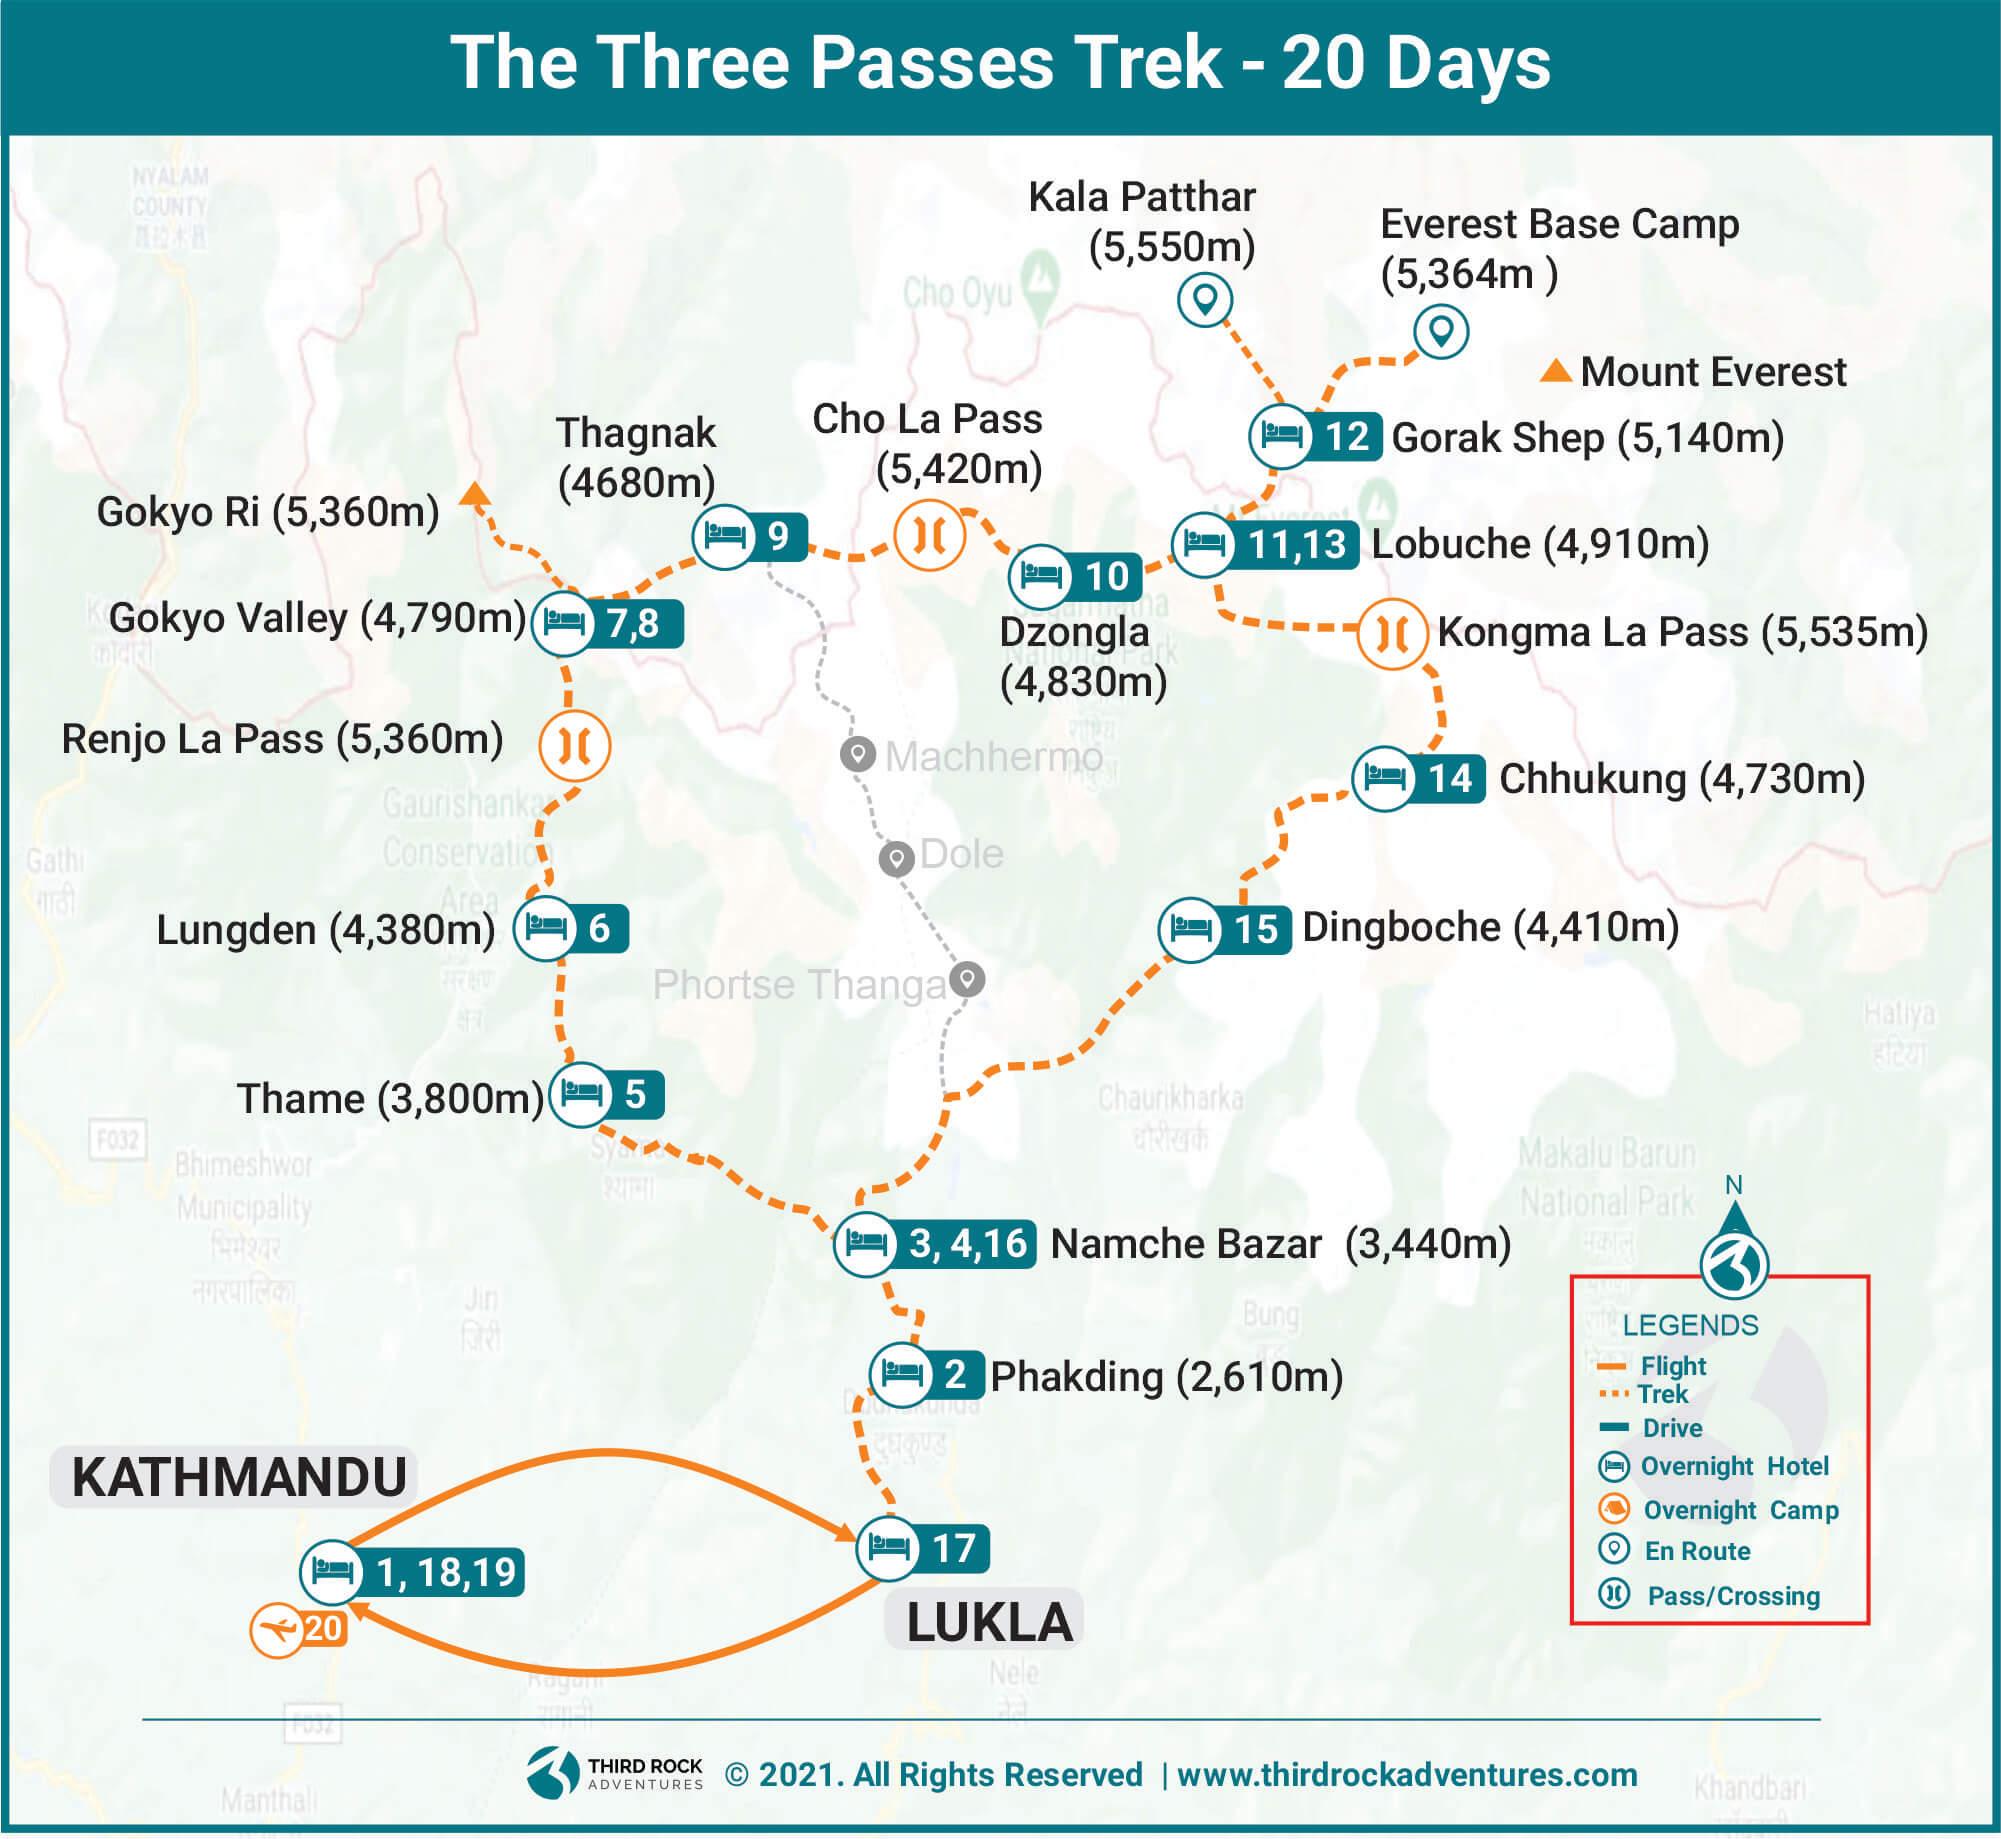 The Three Passes Trek Route Map